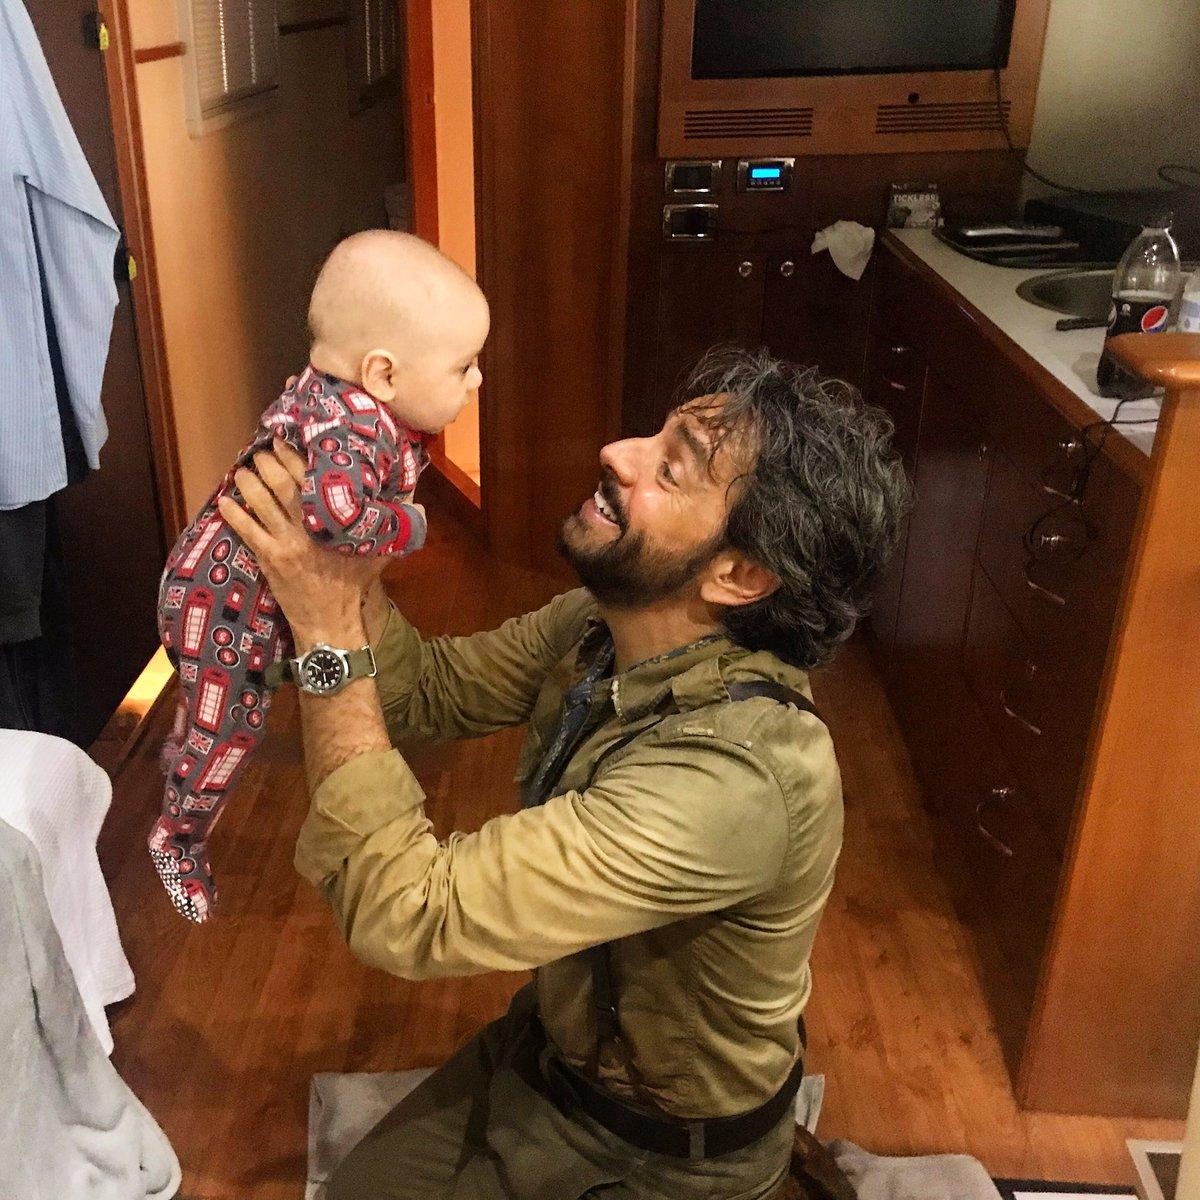 Look who came to visit @EugenioDerbez and I today on set! #BabyBaston #DoraTheExplorer ???? https://t.co/REupPFH98J